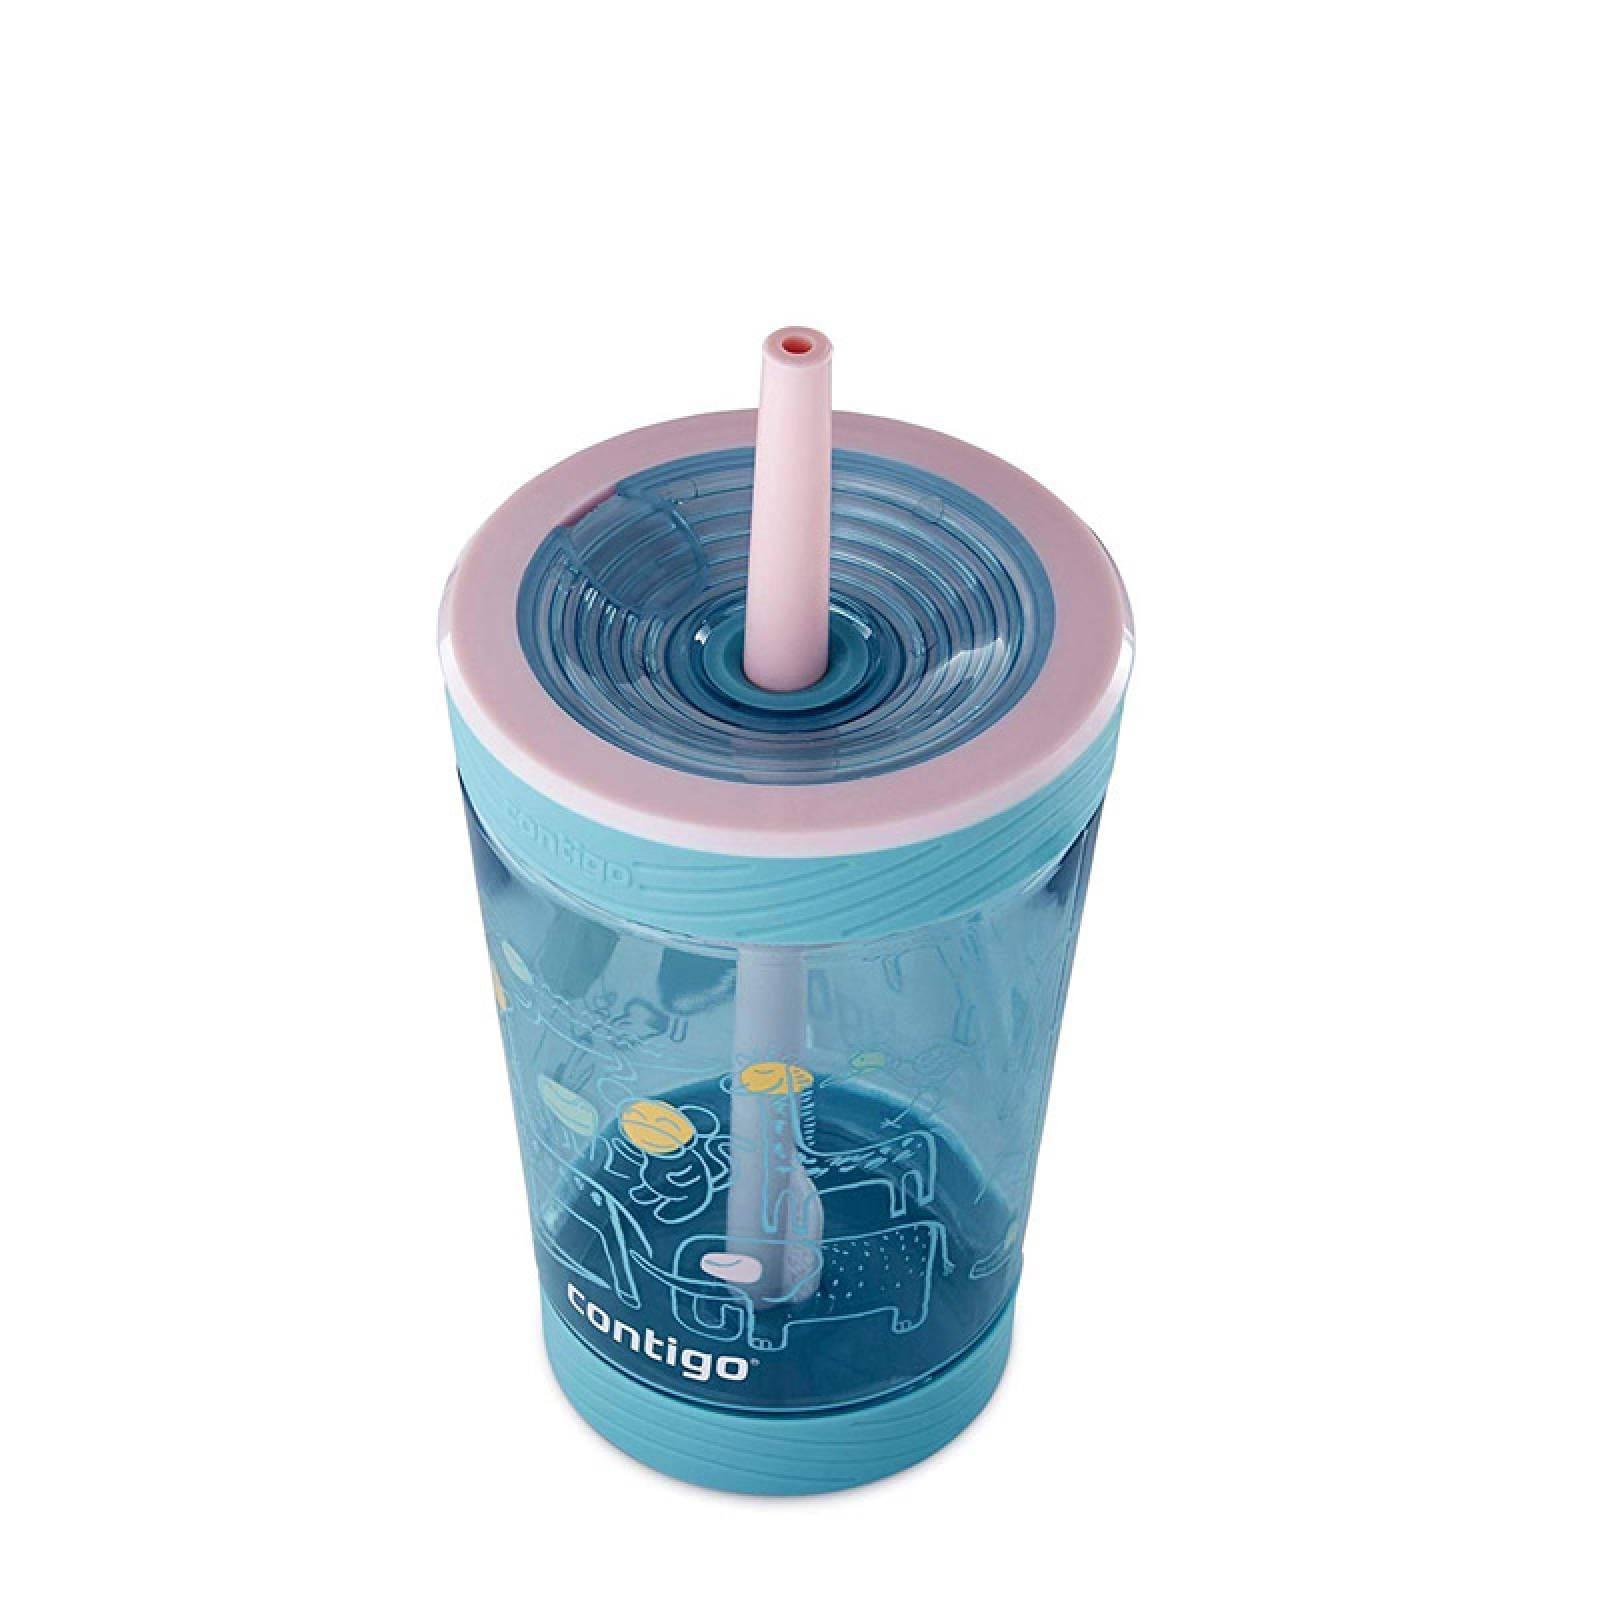 Vaso 14 Oz Antiderrames Niños Plastico + Popote Rosa Contigo